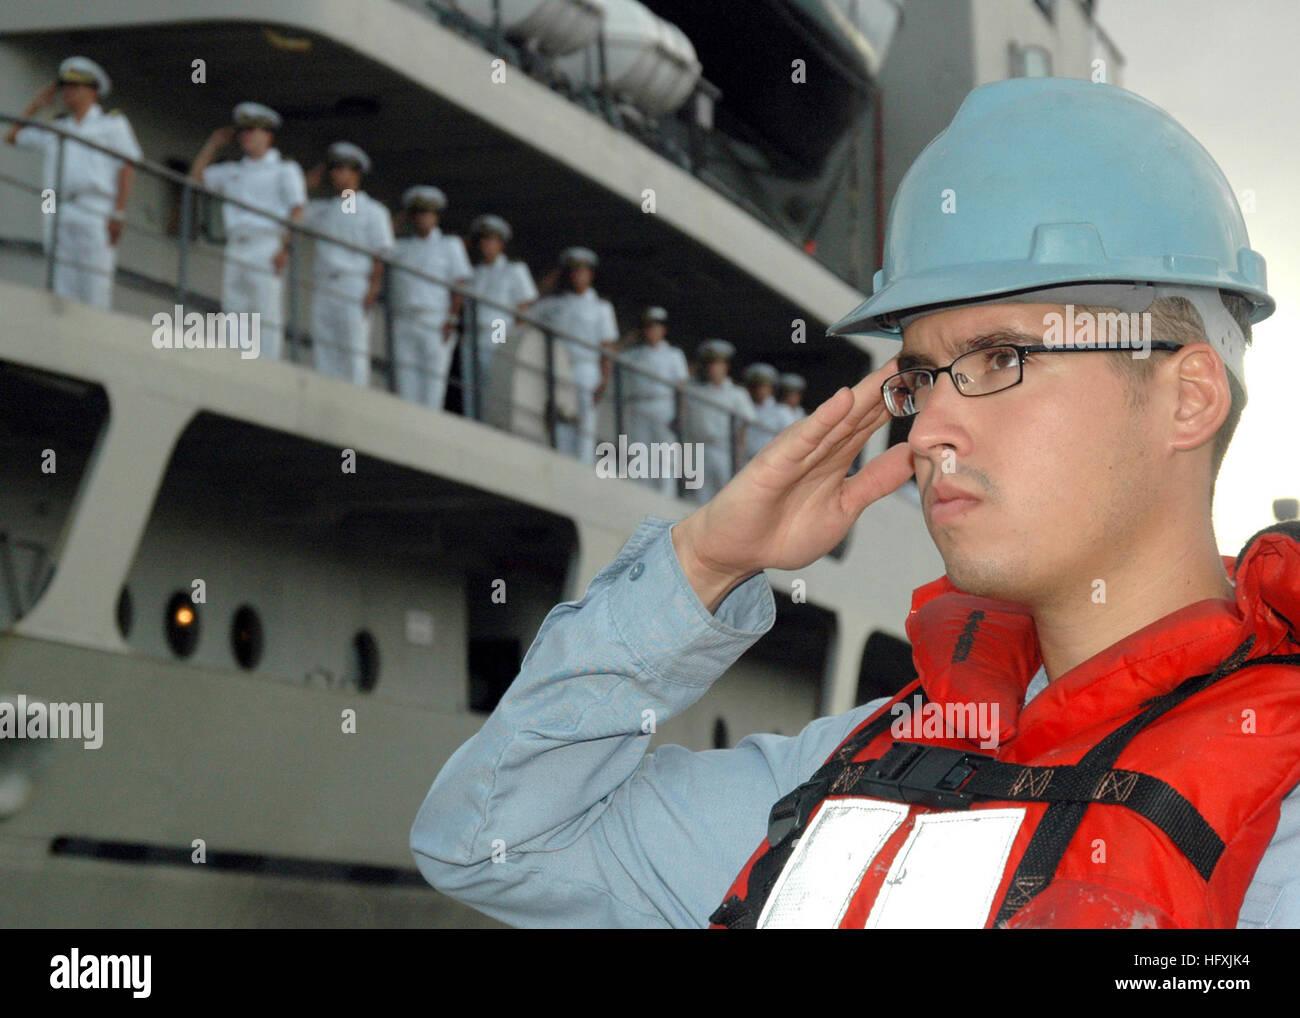 060125-N-3019M-001 Pearl Harbor, Hawaii (Jan. 25, 2006) - Sonar Technician 3rd Class Donnie Garrison salutes the Stock Photo